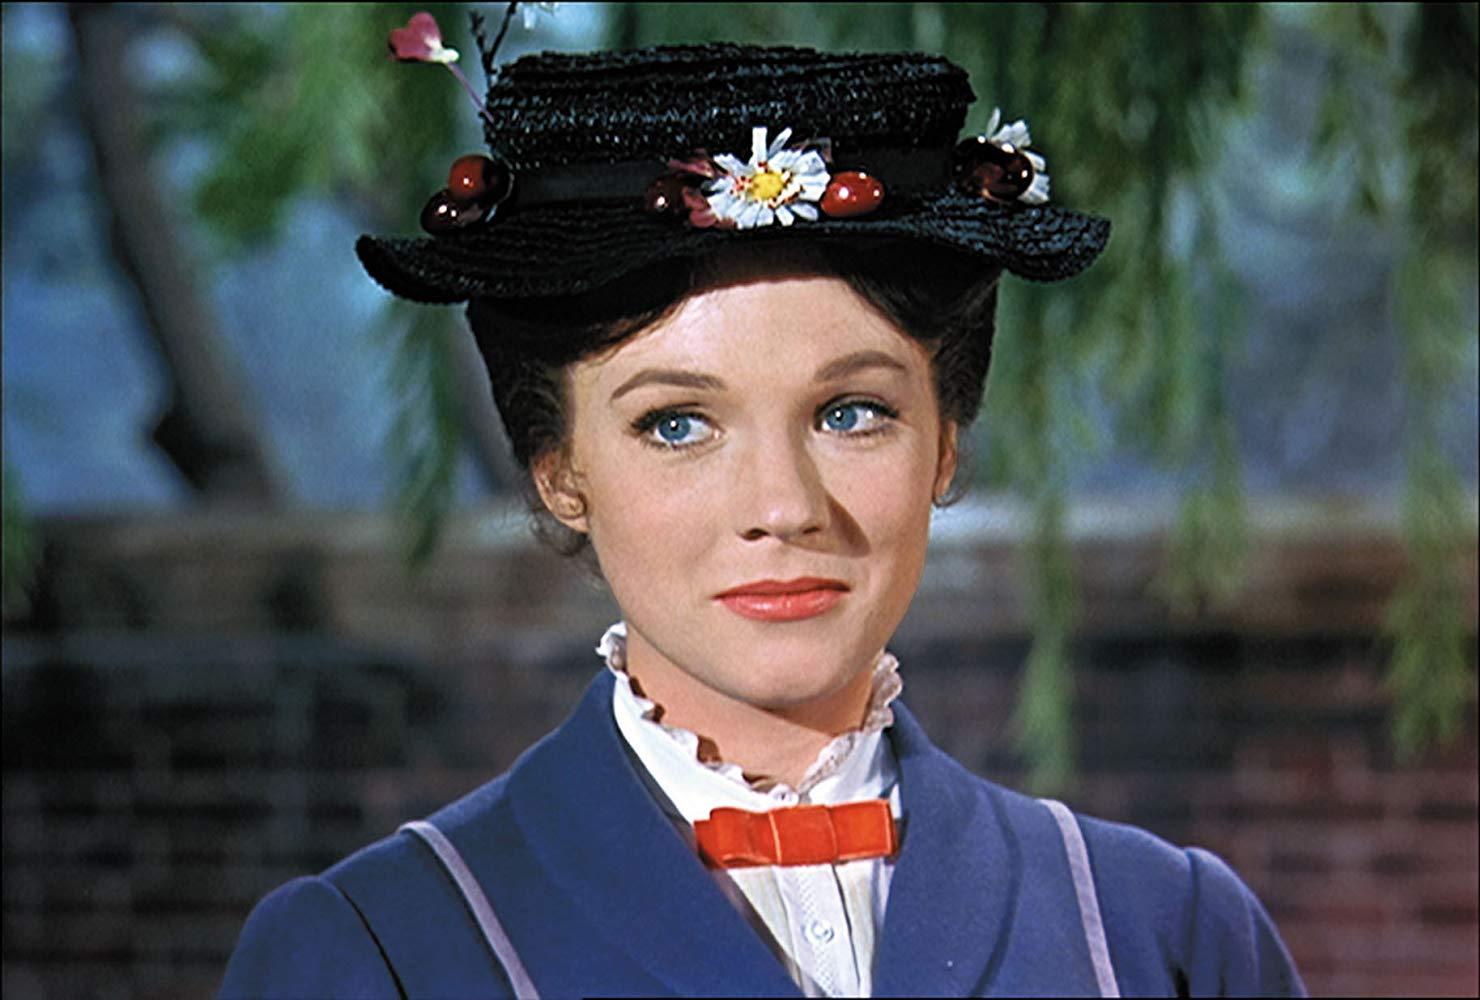 The costume is based on the 1964 film. (Credit: Walt Disney)